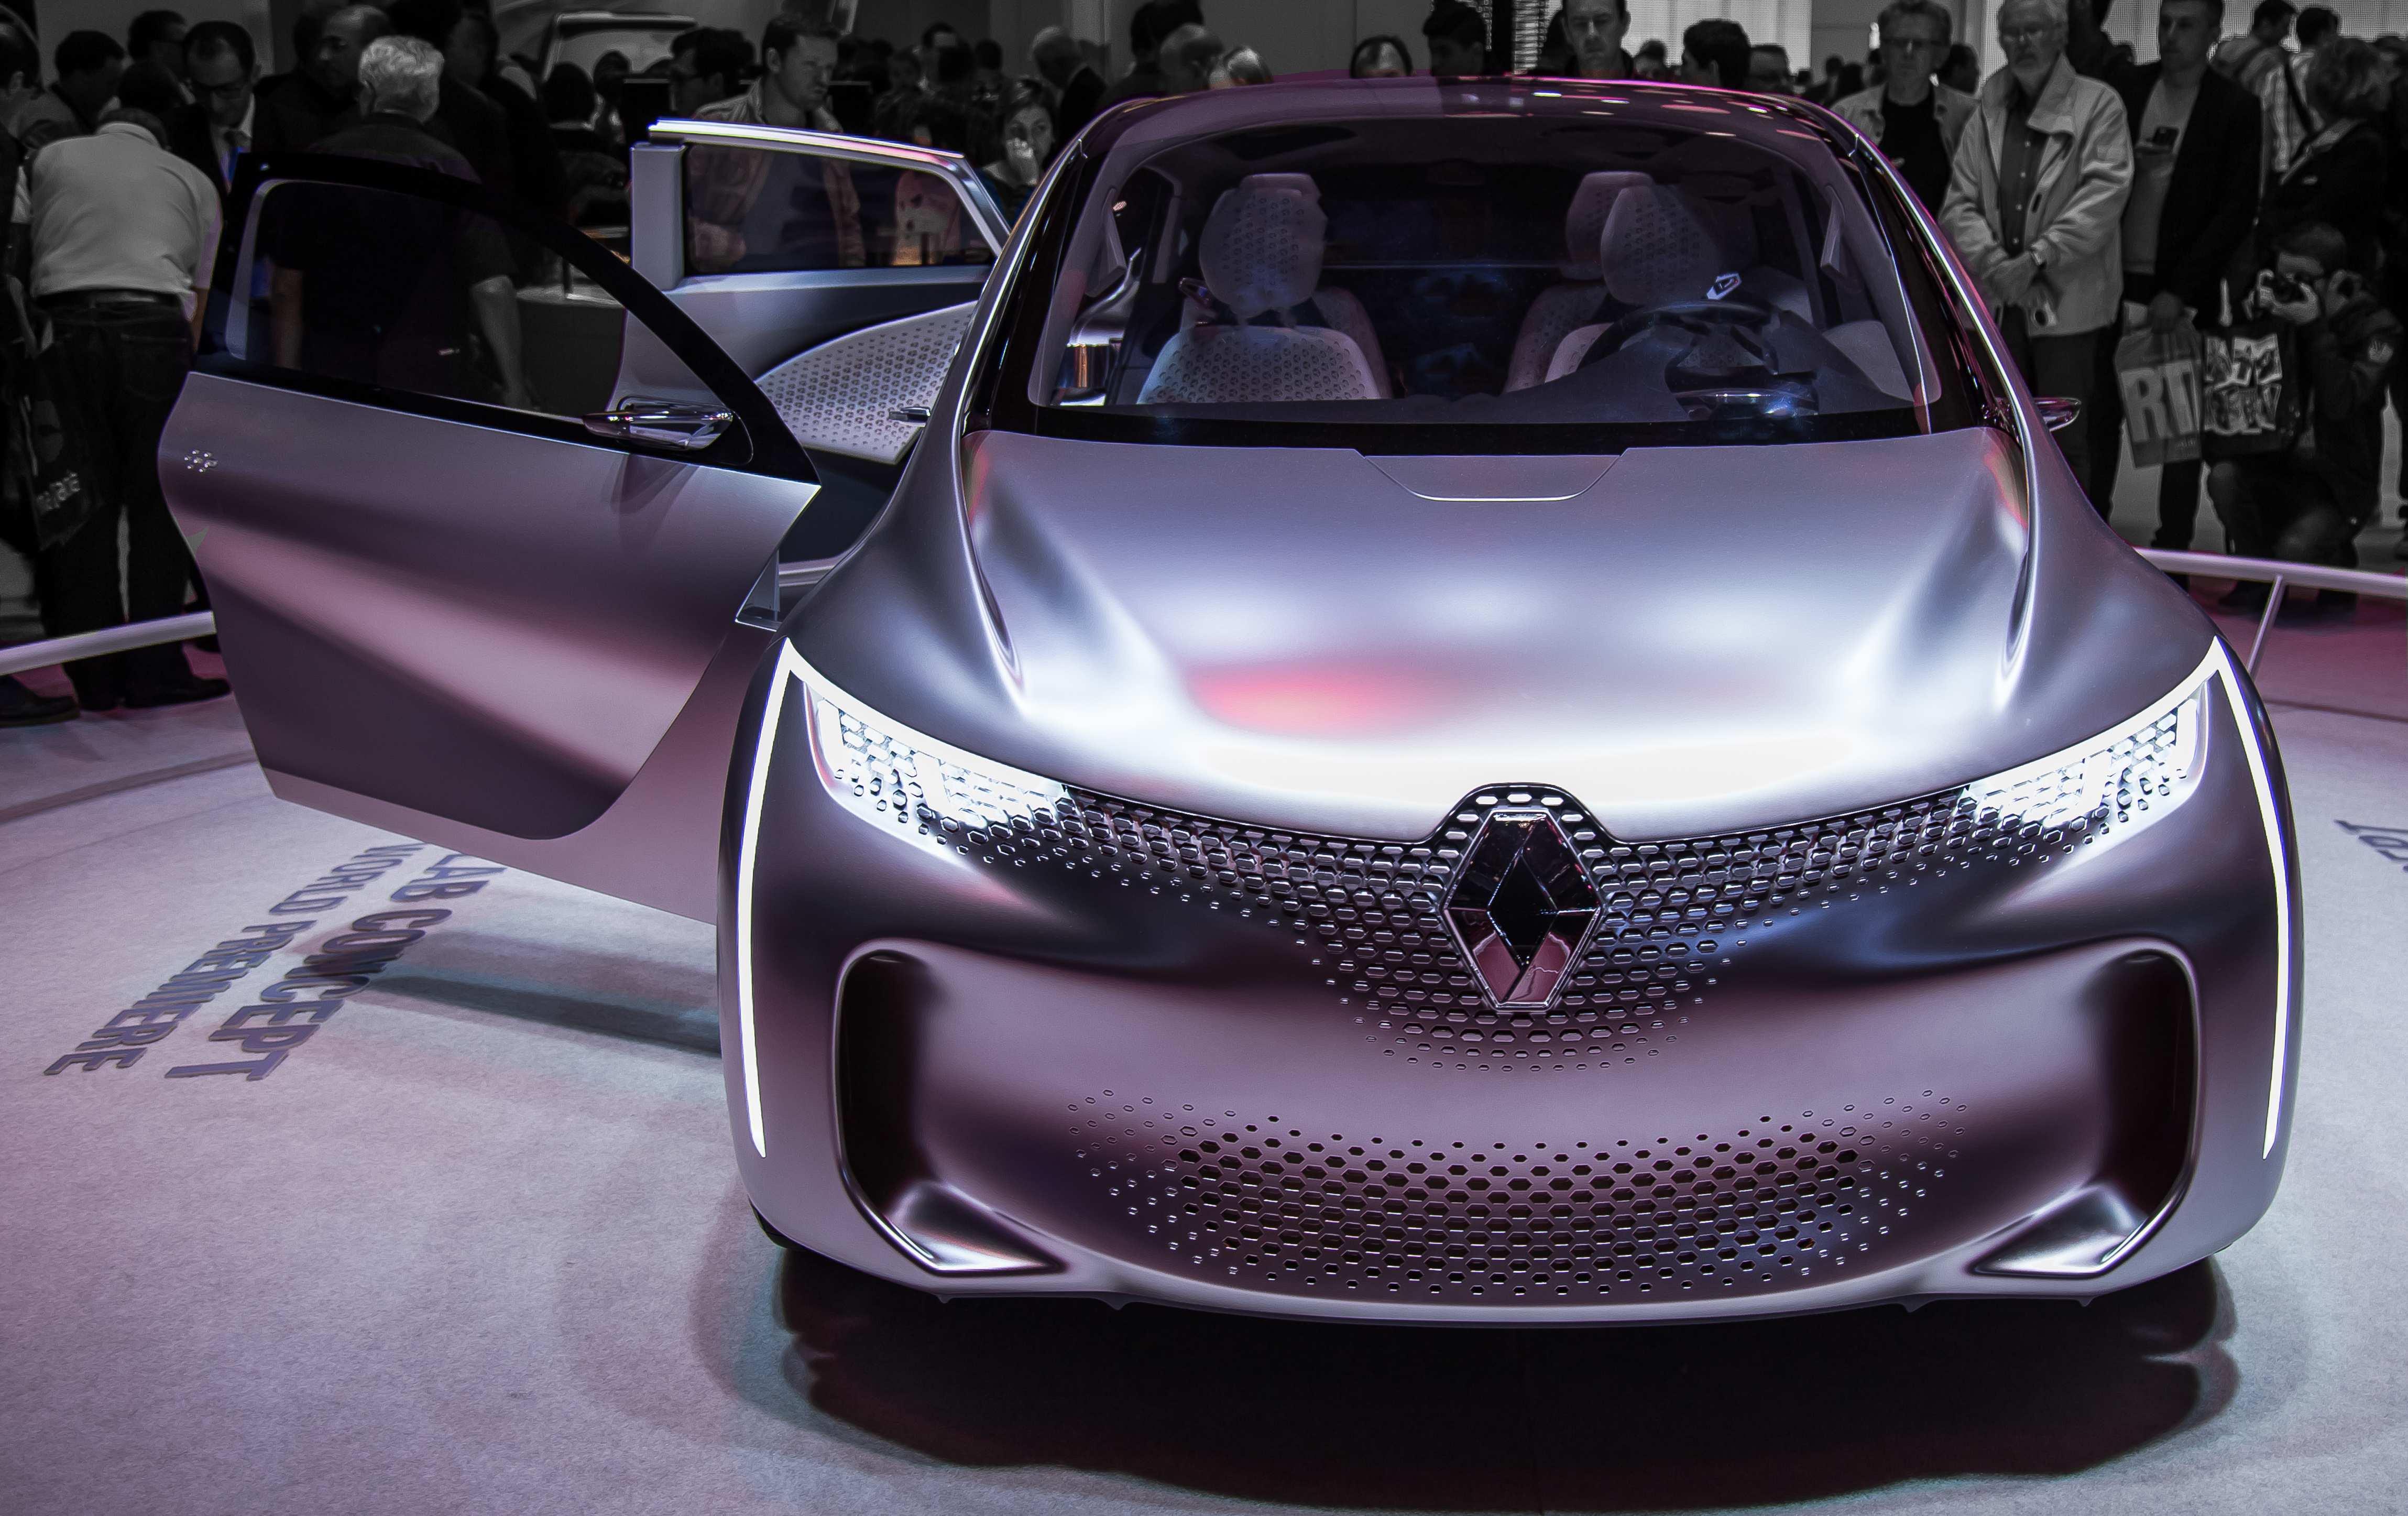 77 Best Review Renault Talisman 2020 Interior for Renault Talisman 2020